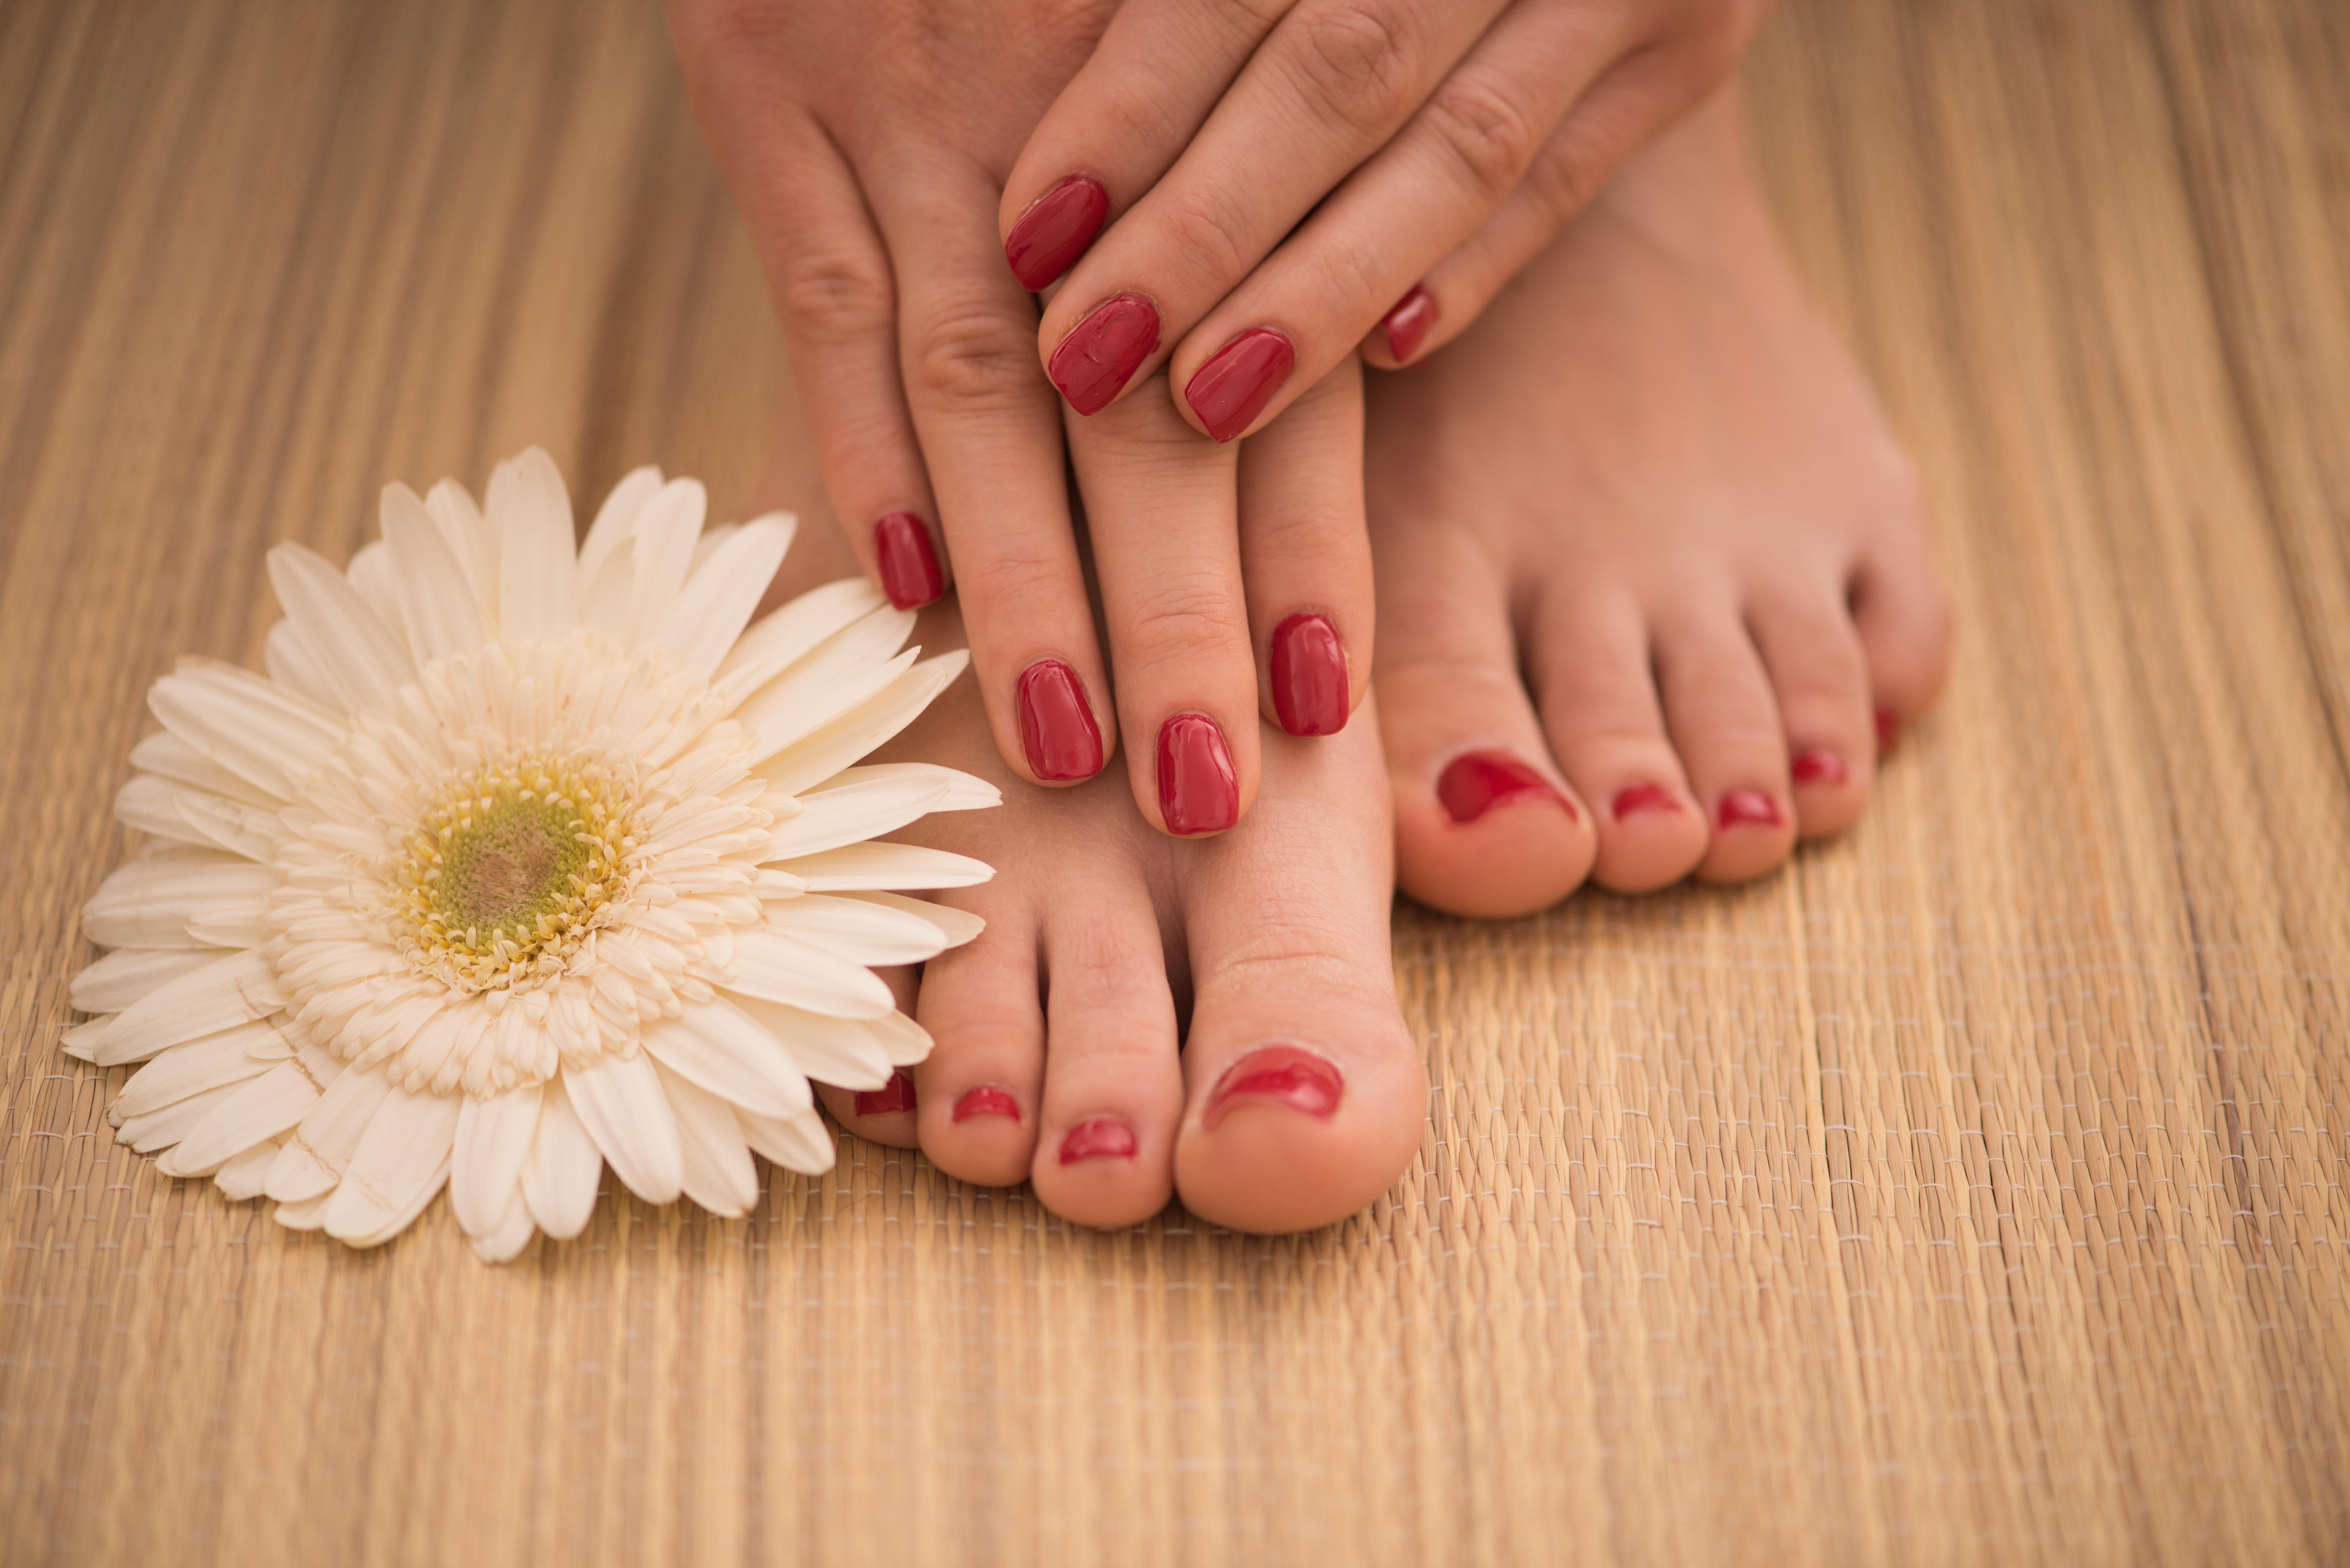 https://0901.nccdn.net/4_2/000/000/024/ec9/Canva---Female-Feet-and-Hands-at-Spa-Salon.jpg